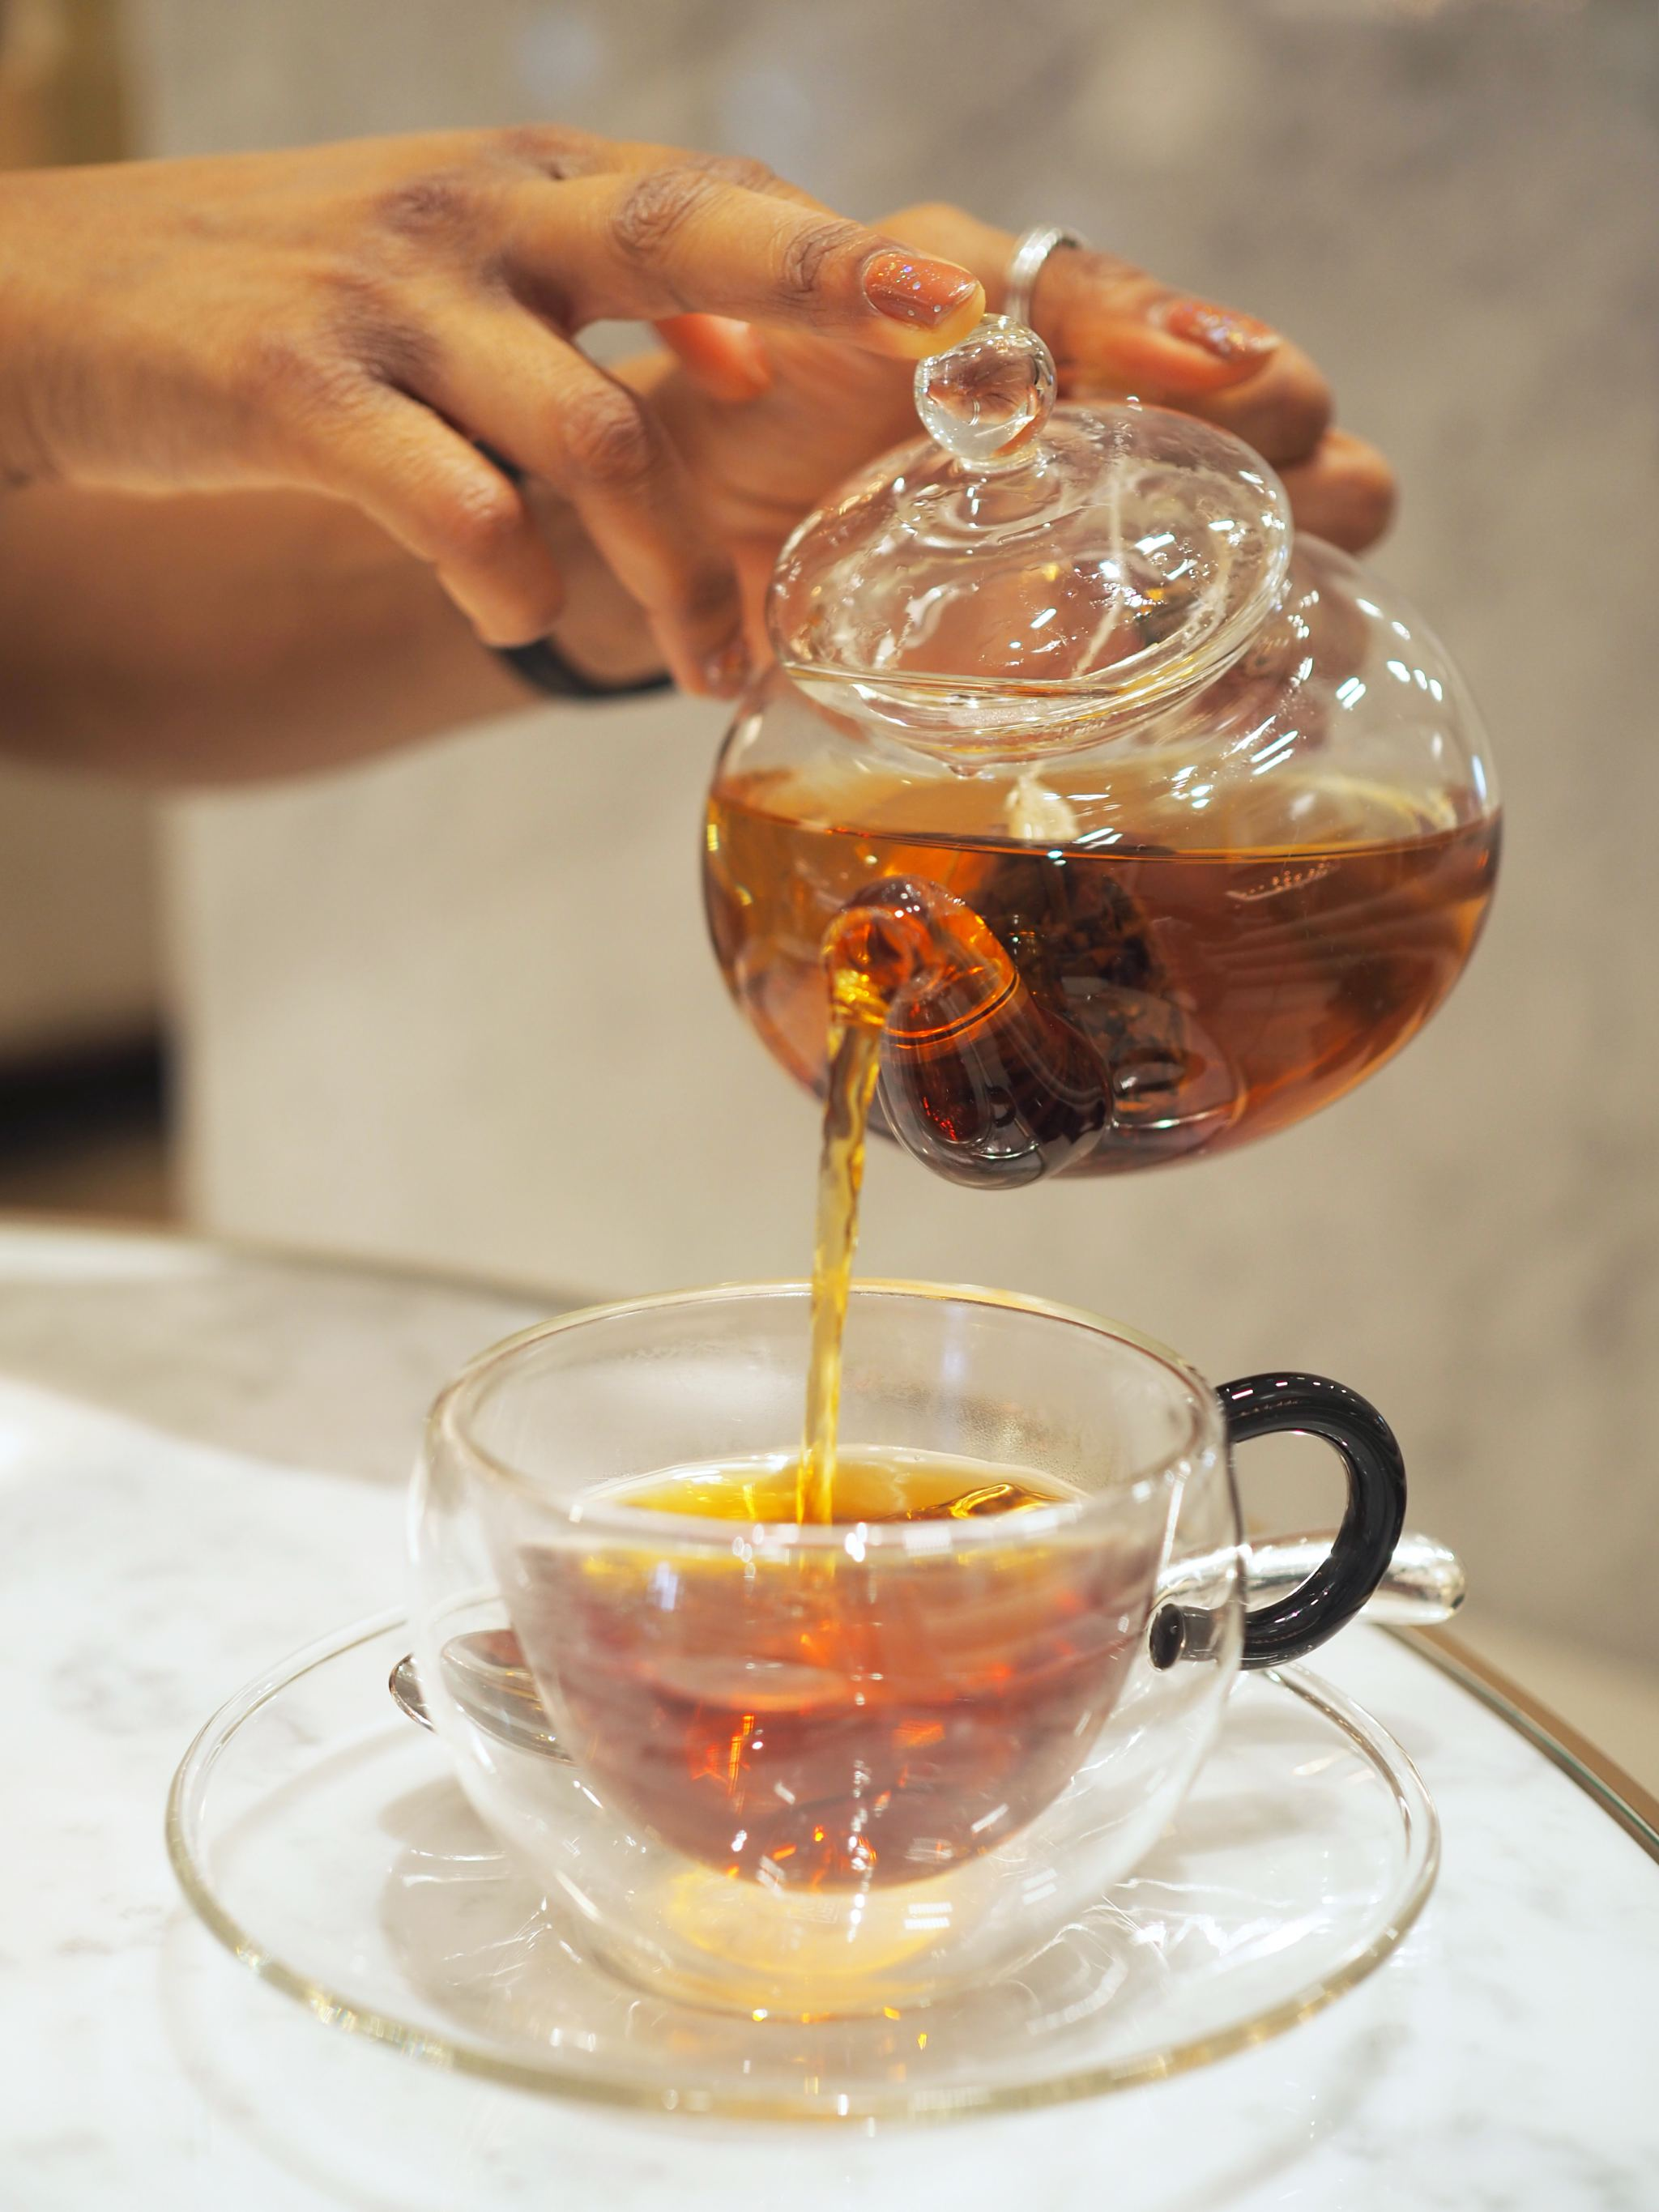 Royal Lancaster Hotel Afternoon Tea